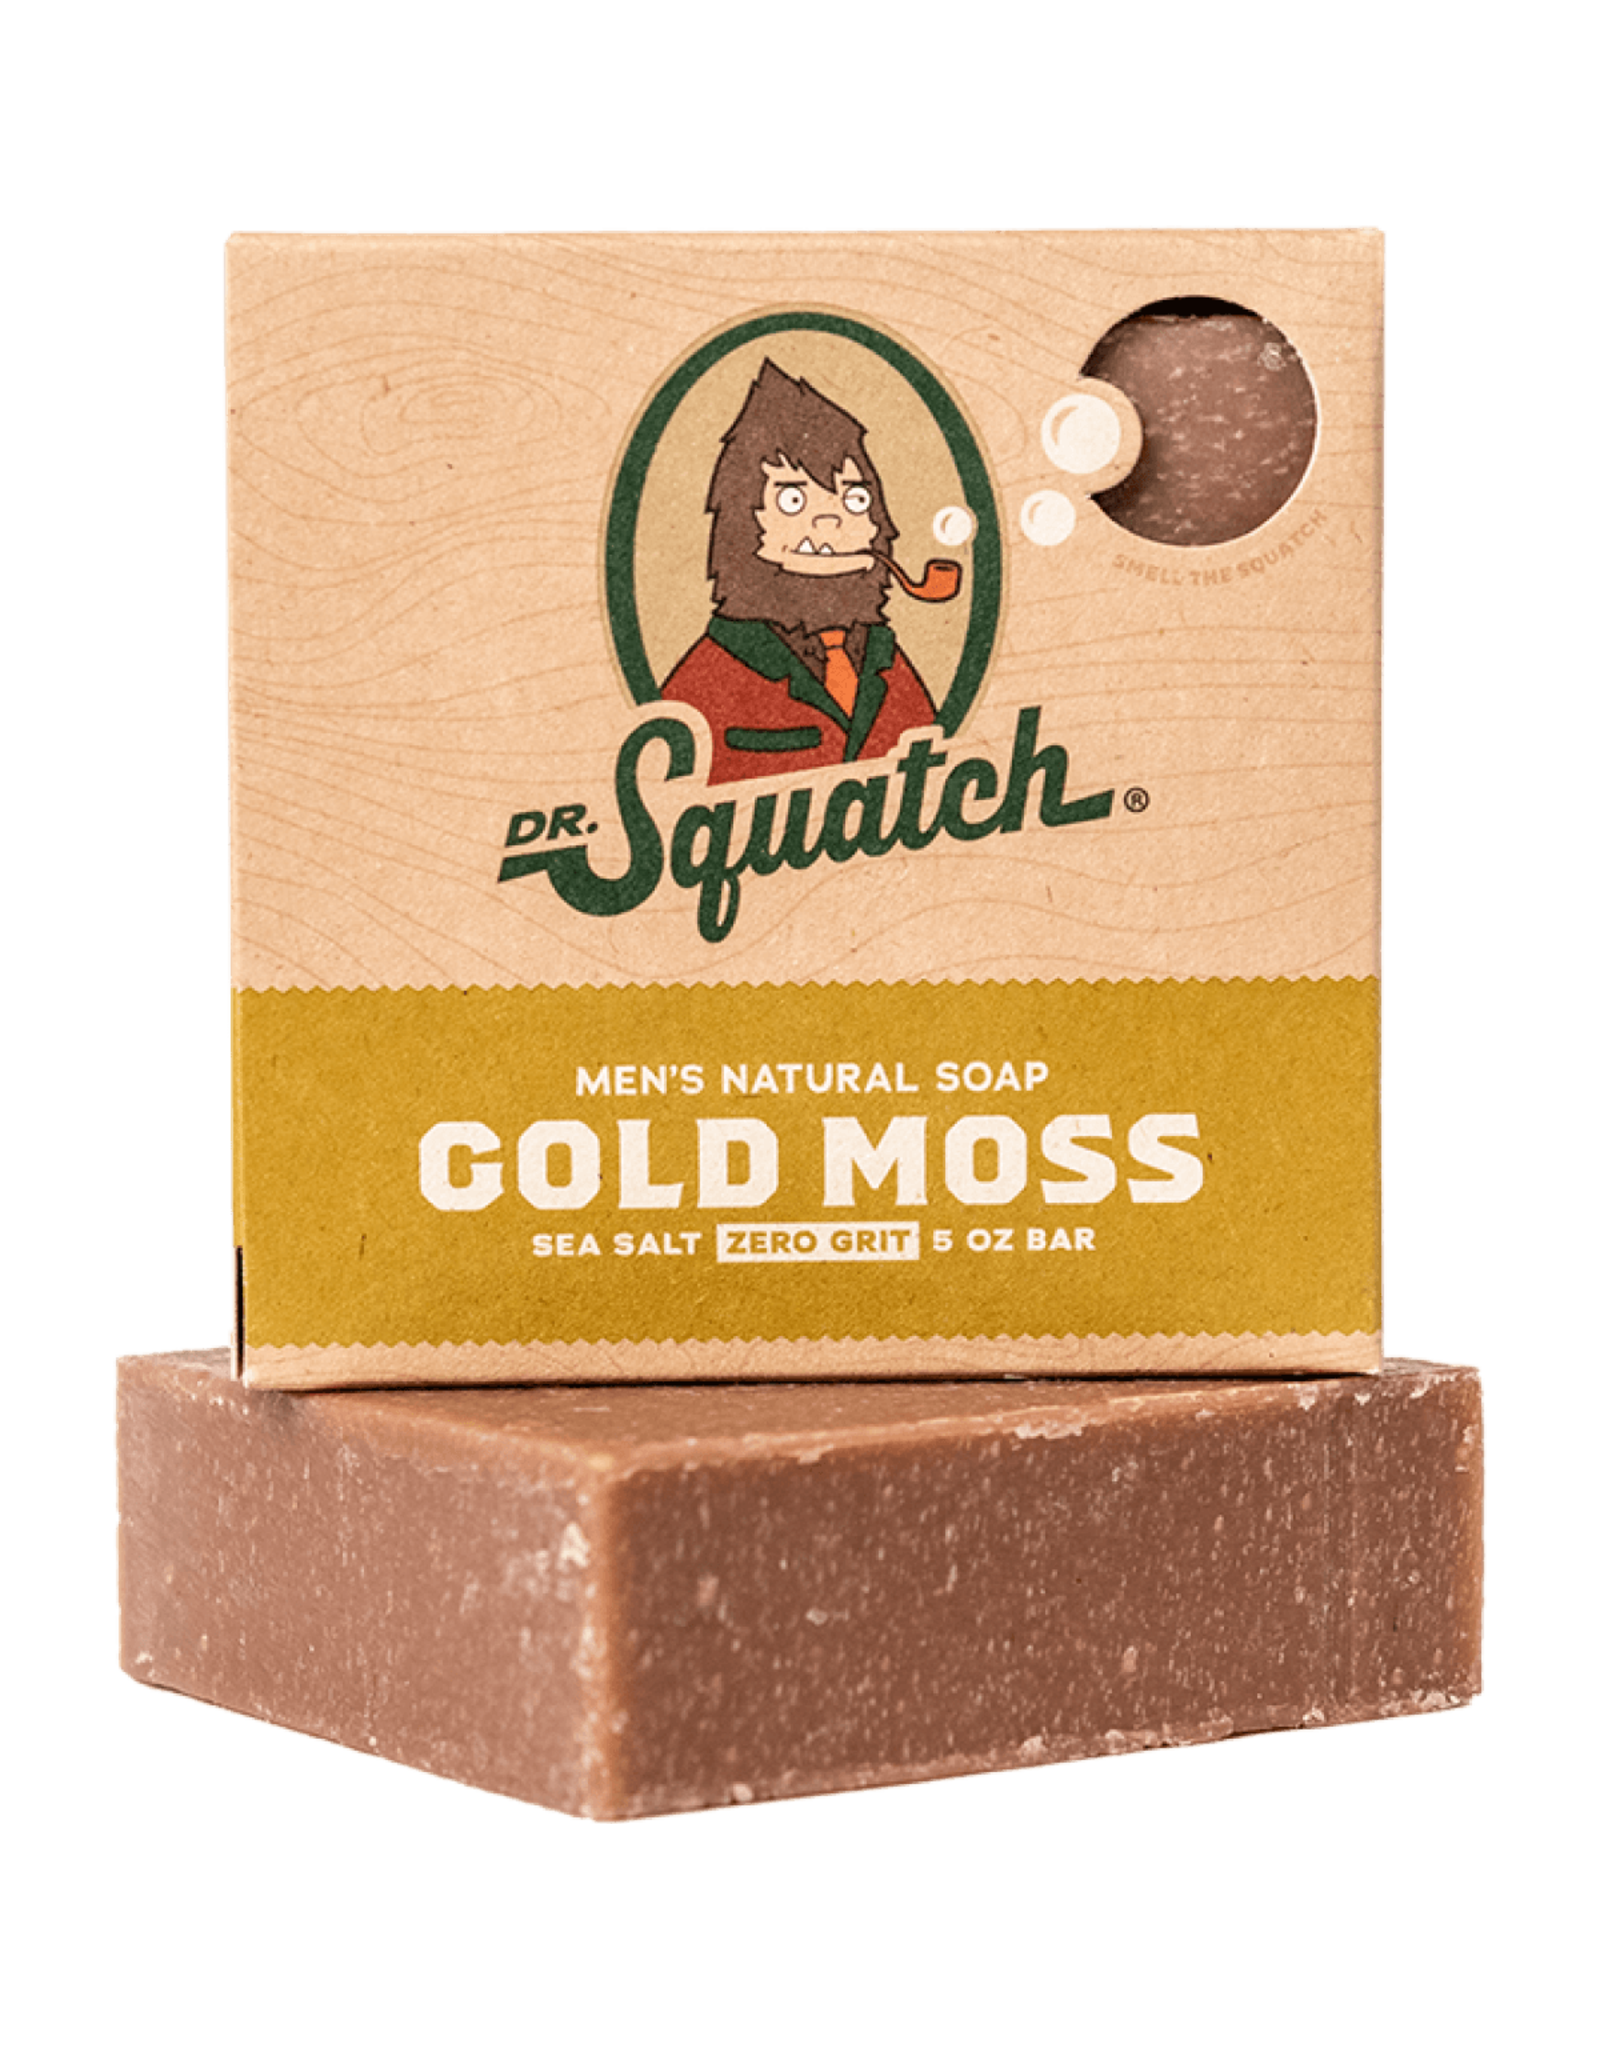 Dr. Squatch Gold Moss Scrub Soap